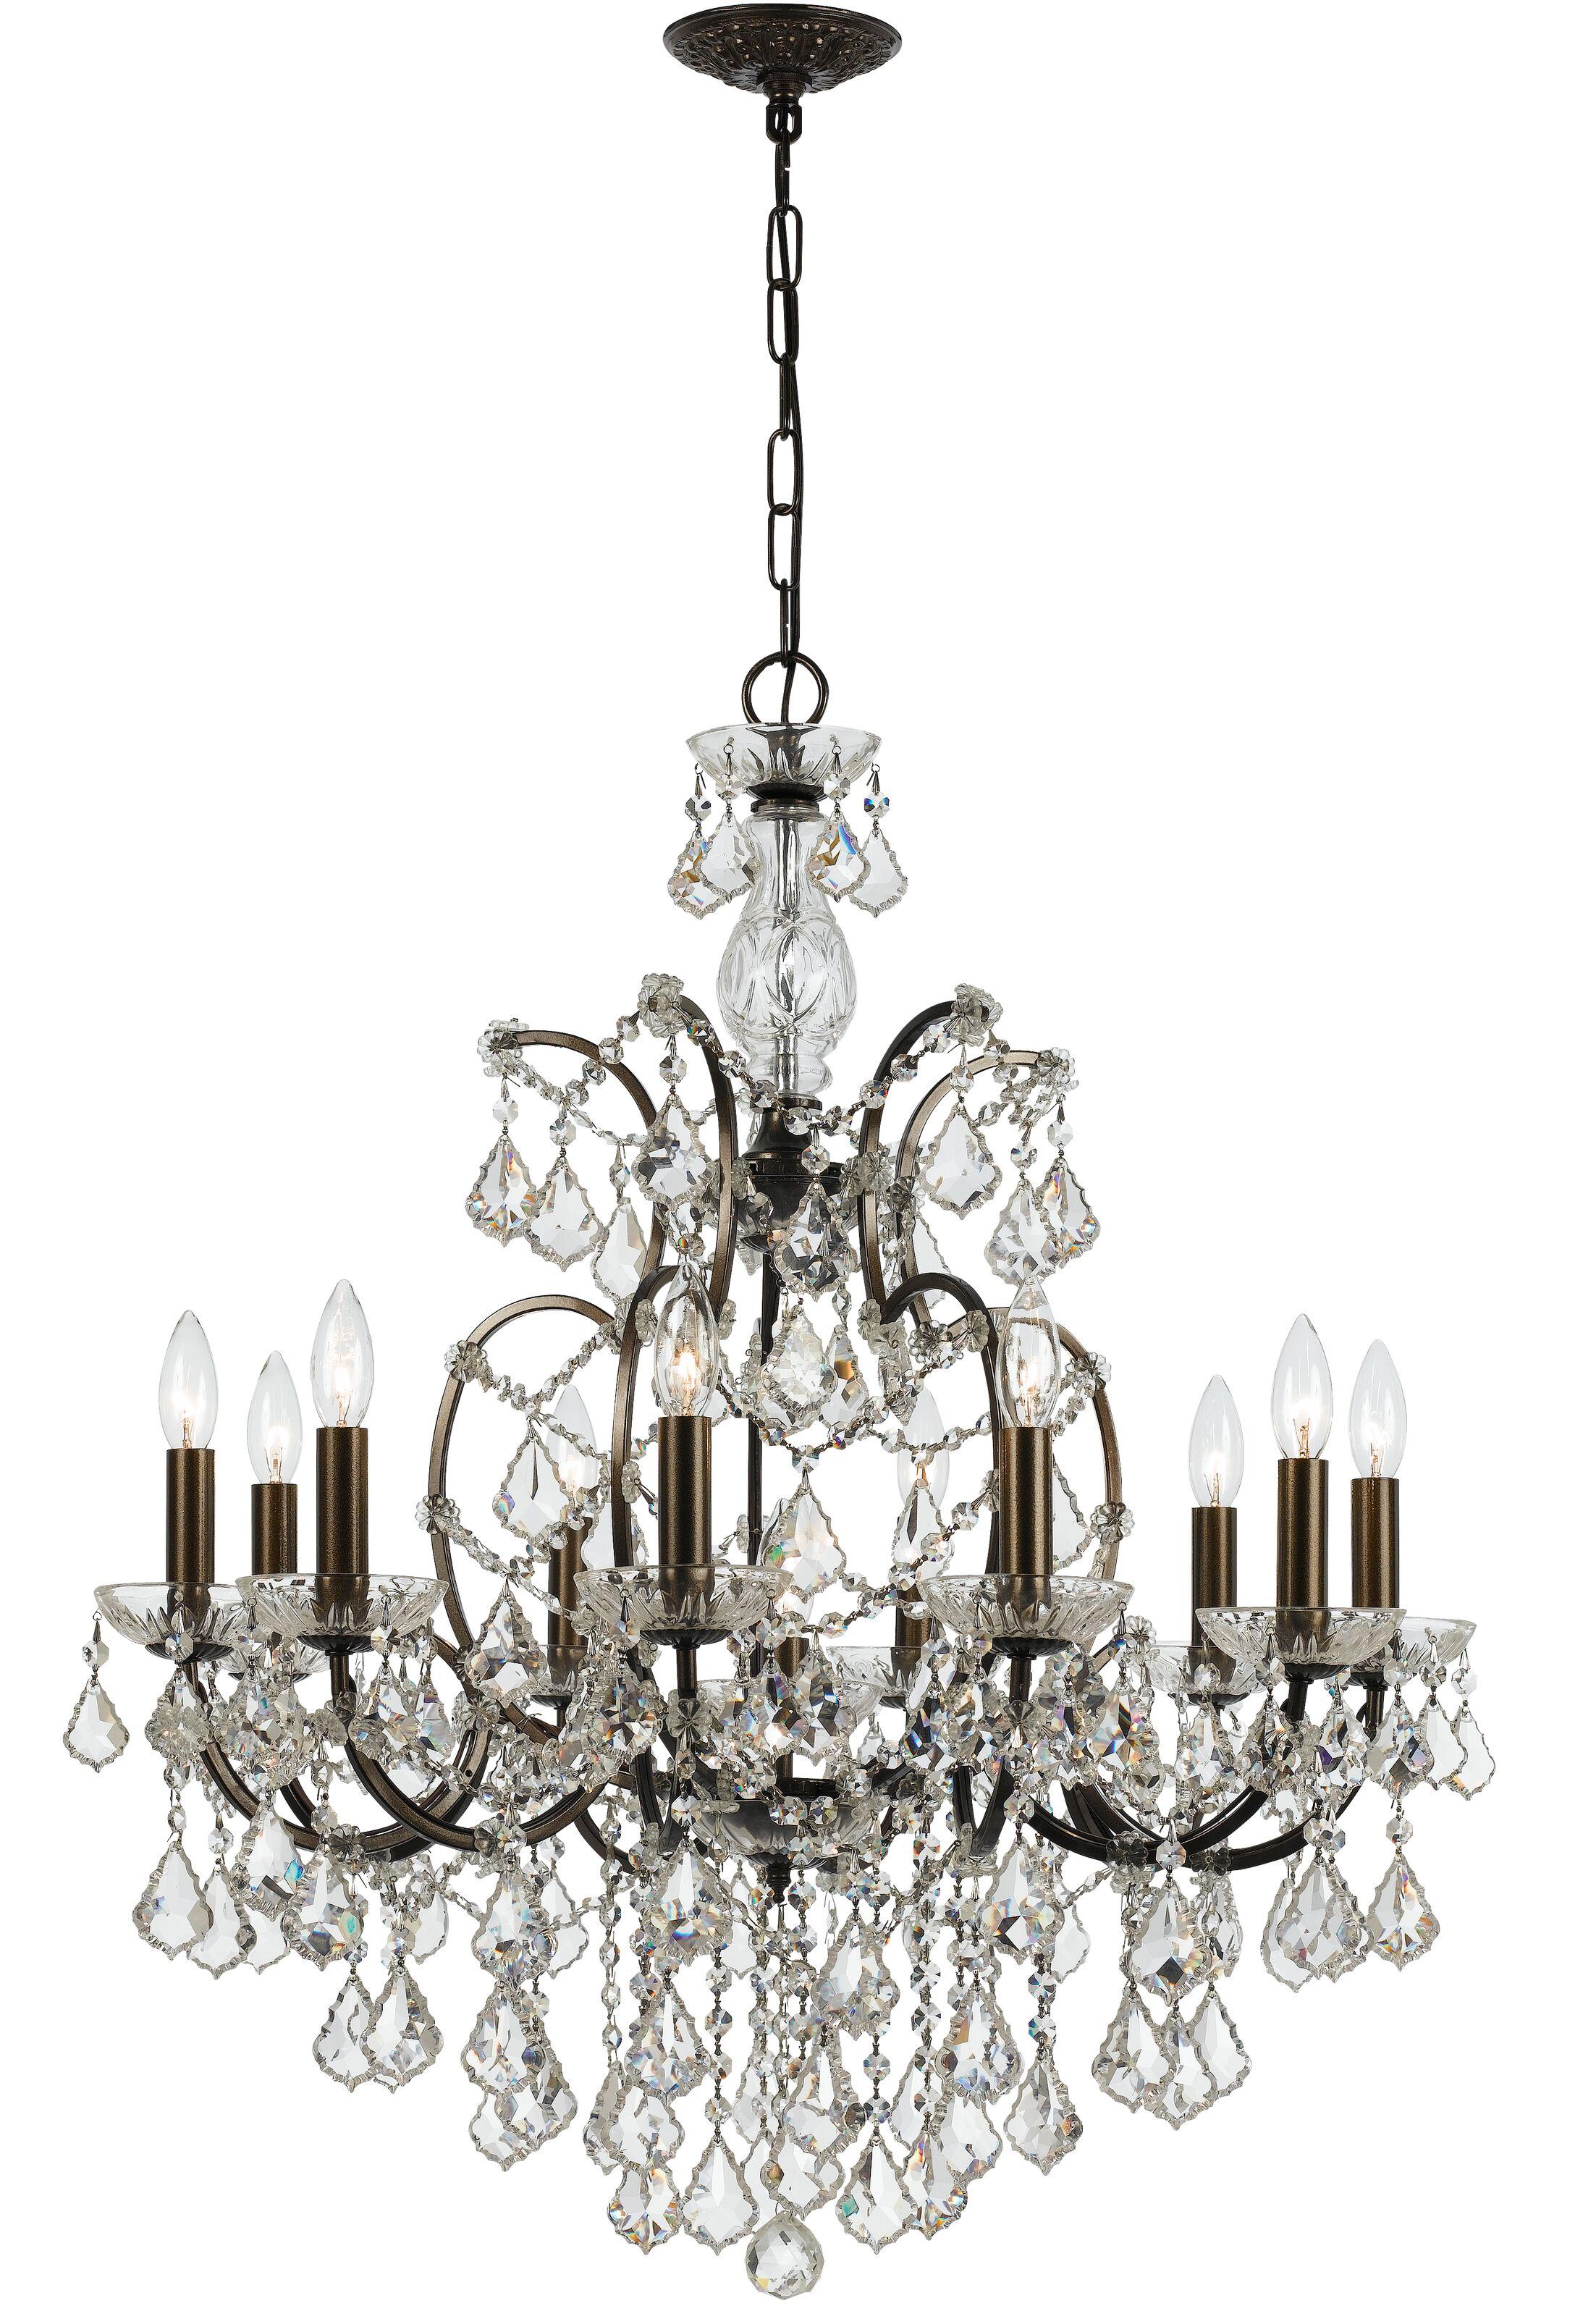 Maira 10-Light Candle Style Chandelier Crystal Grade: Swarovski Elements, Finish: Vibrant Bronze